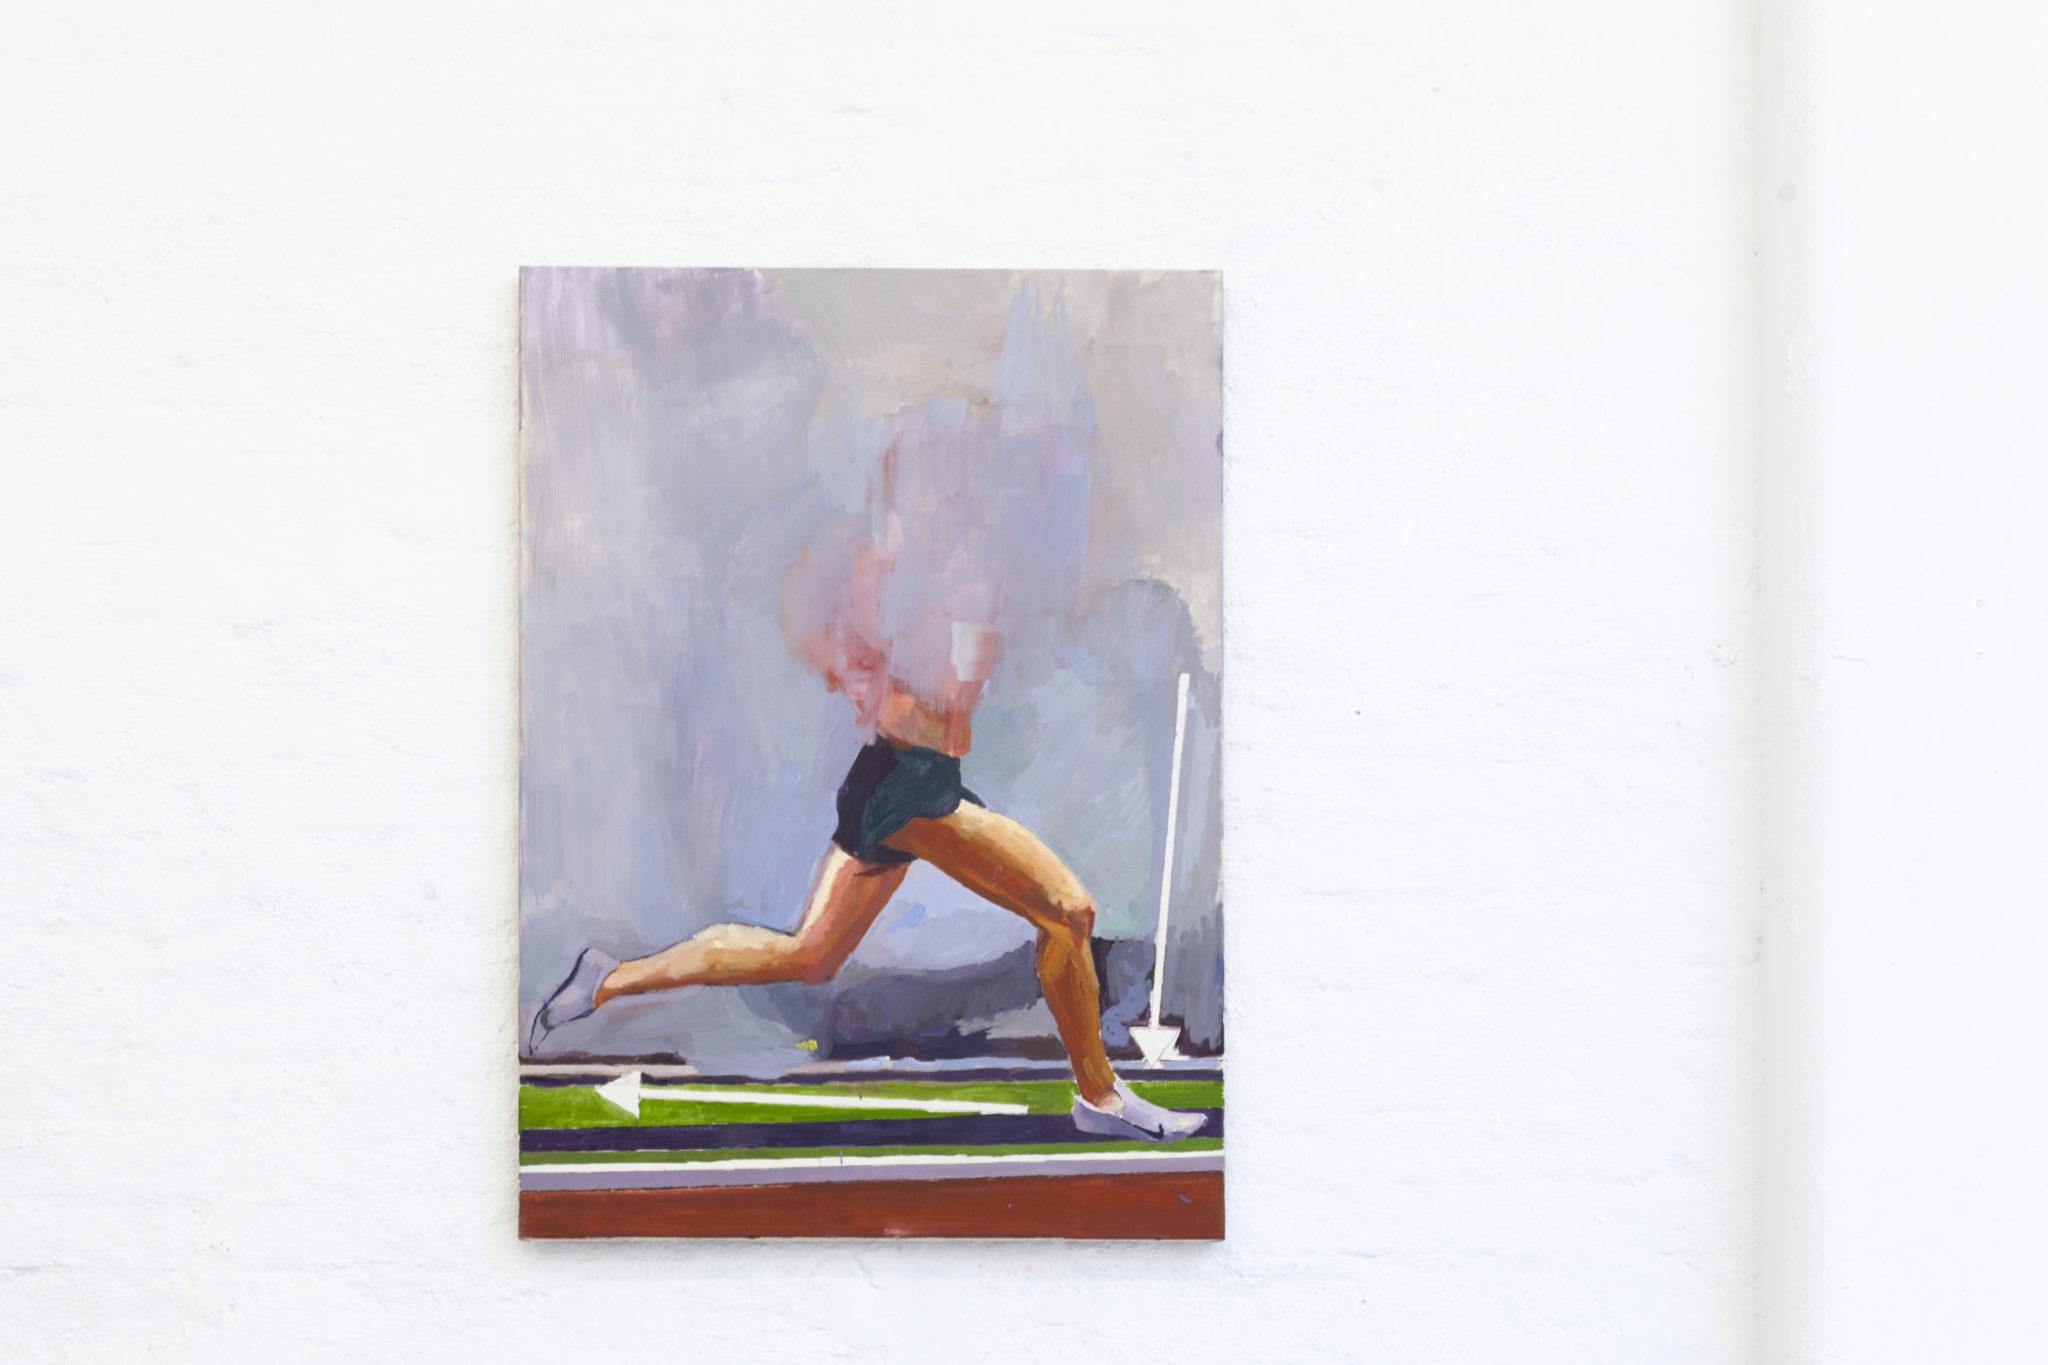 Bosse Bergfeld, How to run in proper form, Öl auf Leinwand, 120 x 80 cm, 2021_1